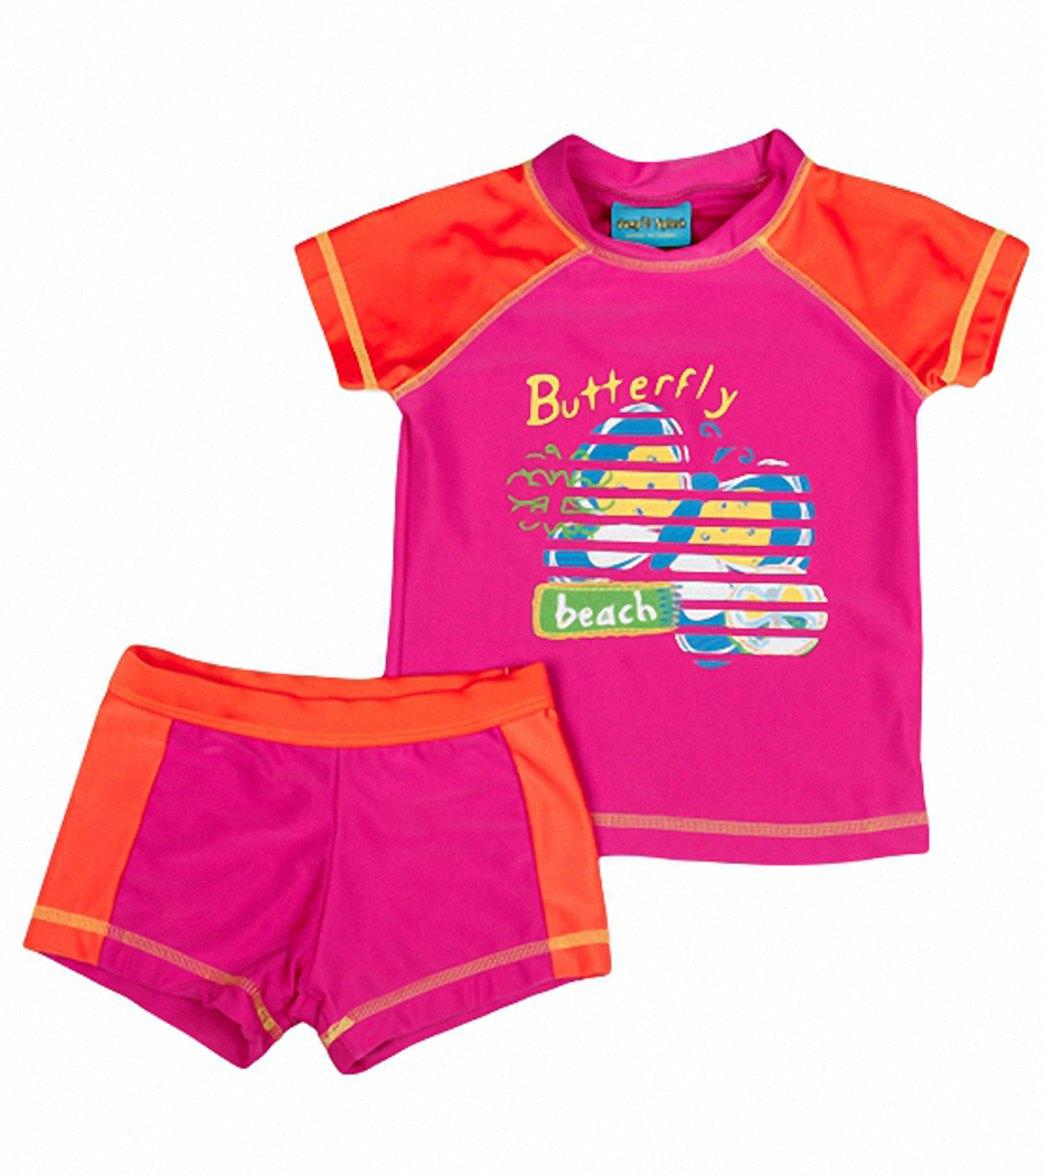 21e60d1631 Jump N Splash Girls' Butterfly S/S Rashguard Set w/FREE Goggles (4 ...